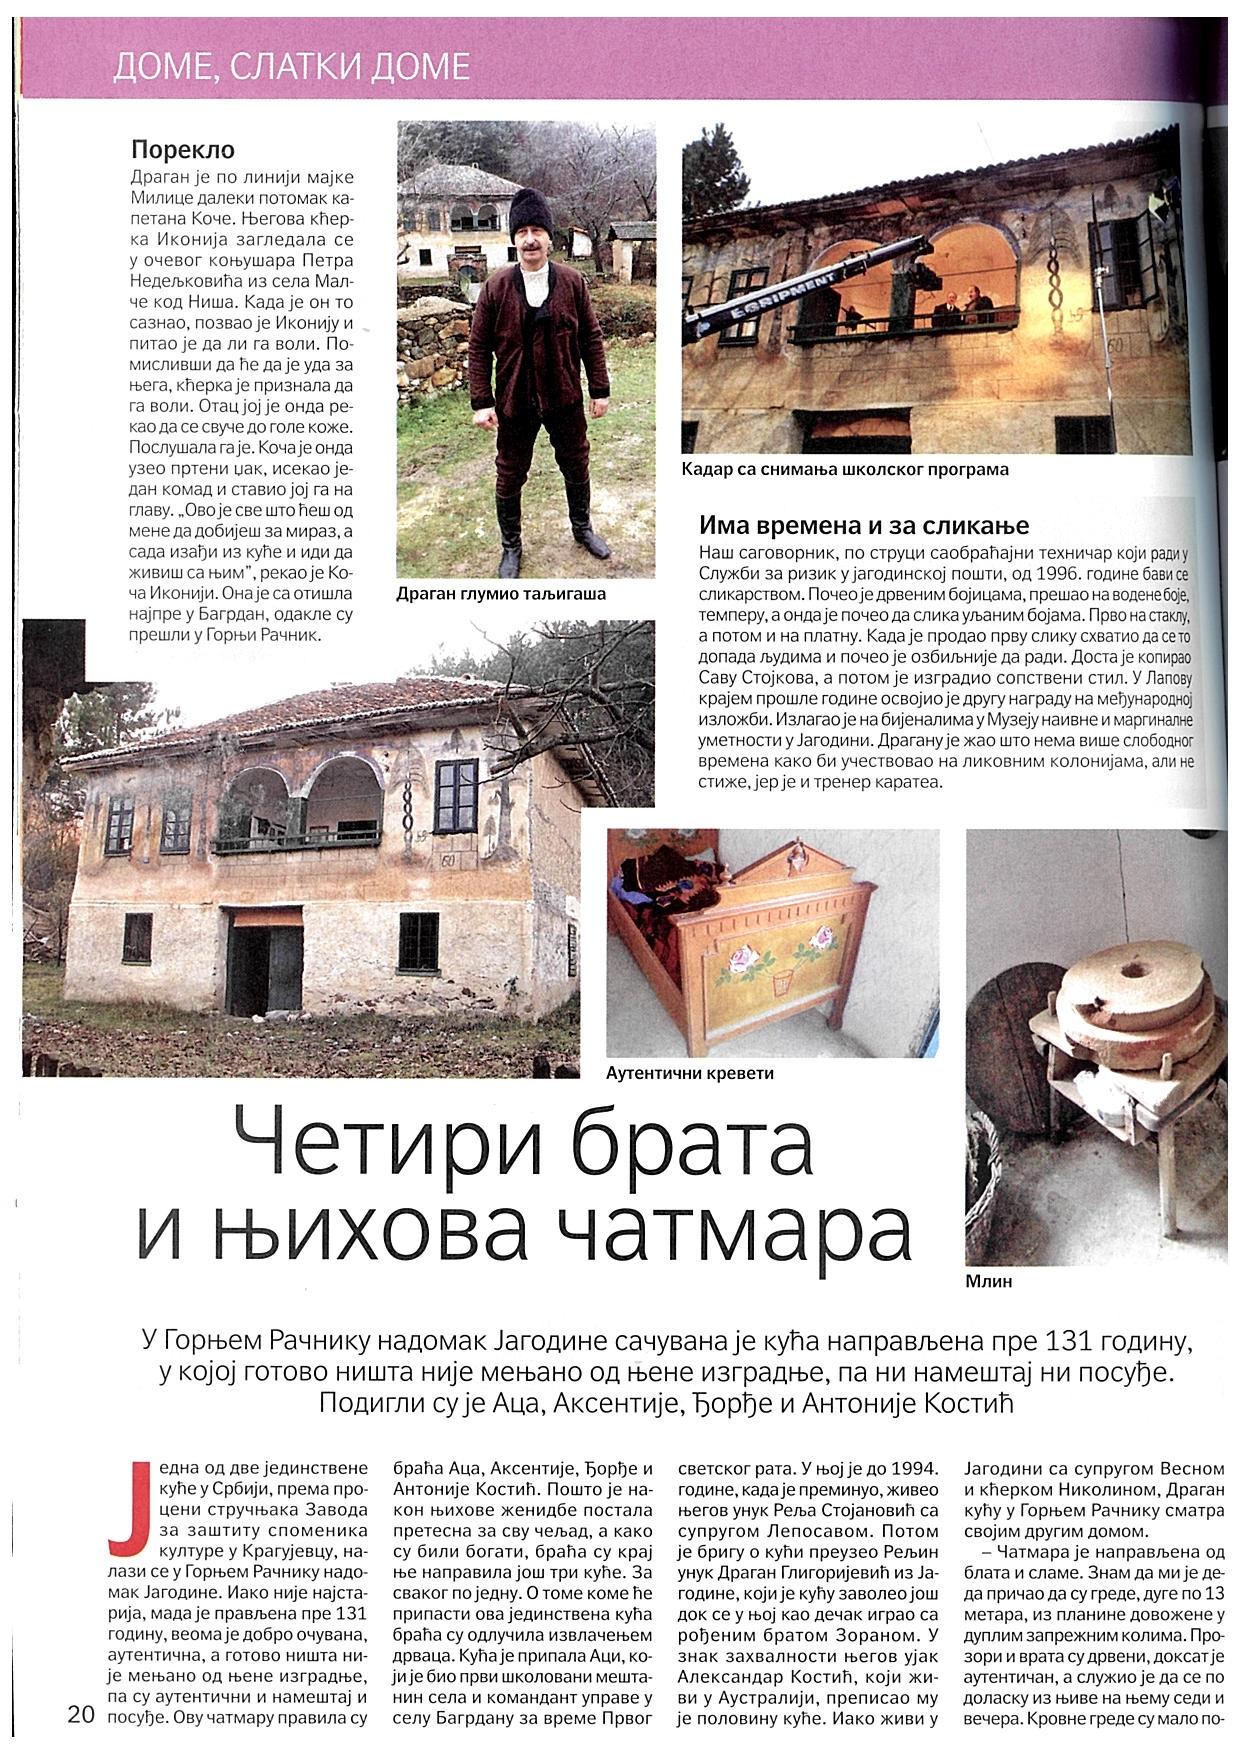 Politikin Magazin - Dome, statki dome 1